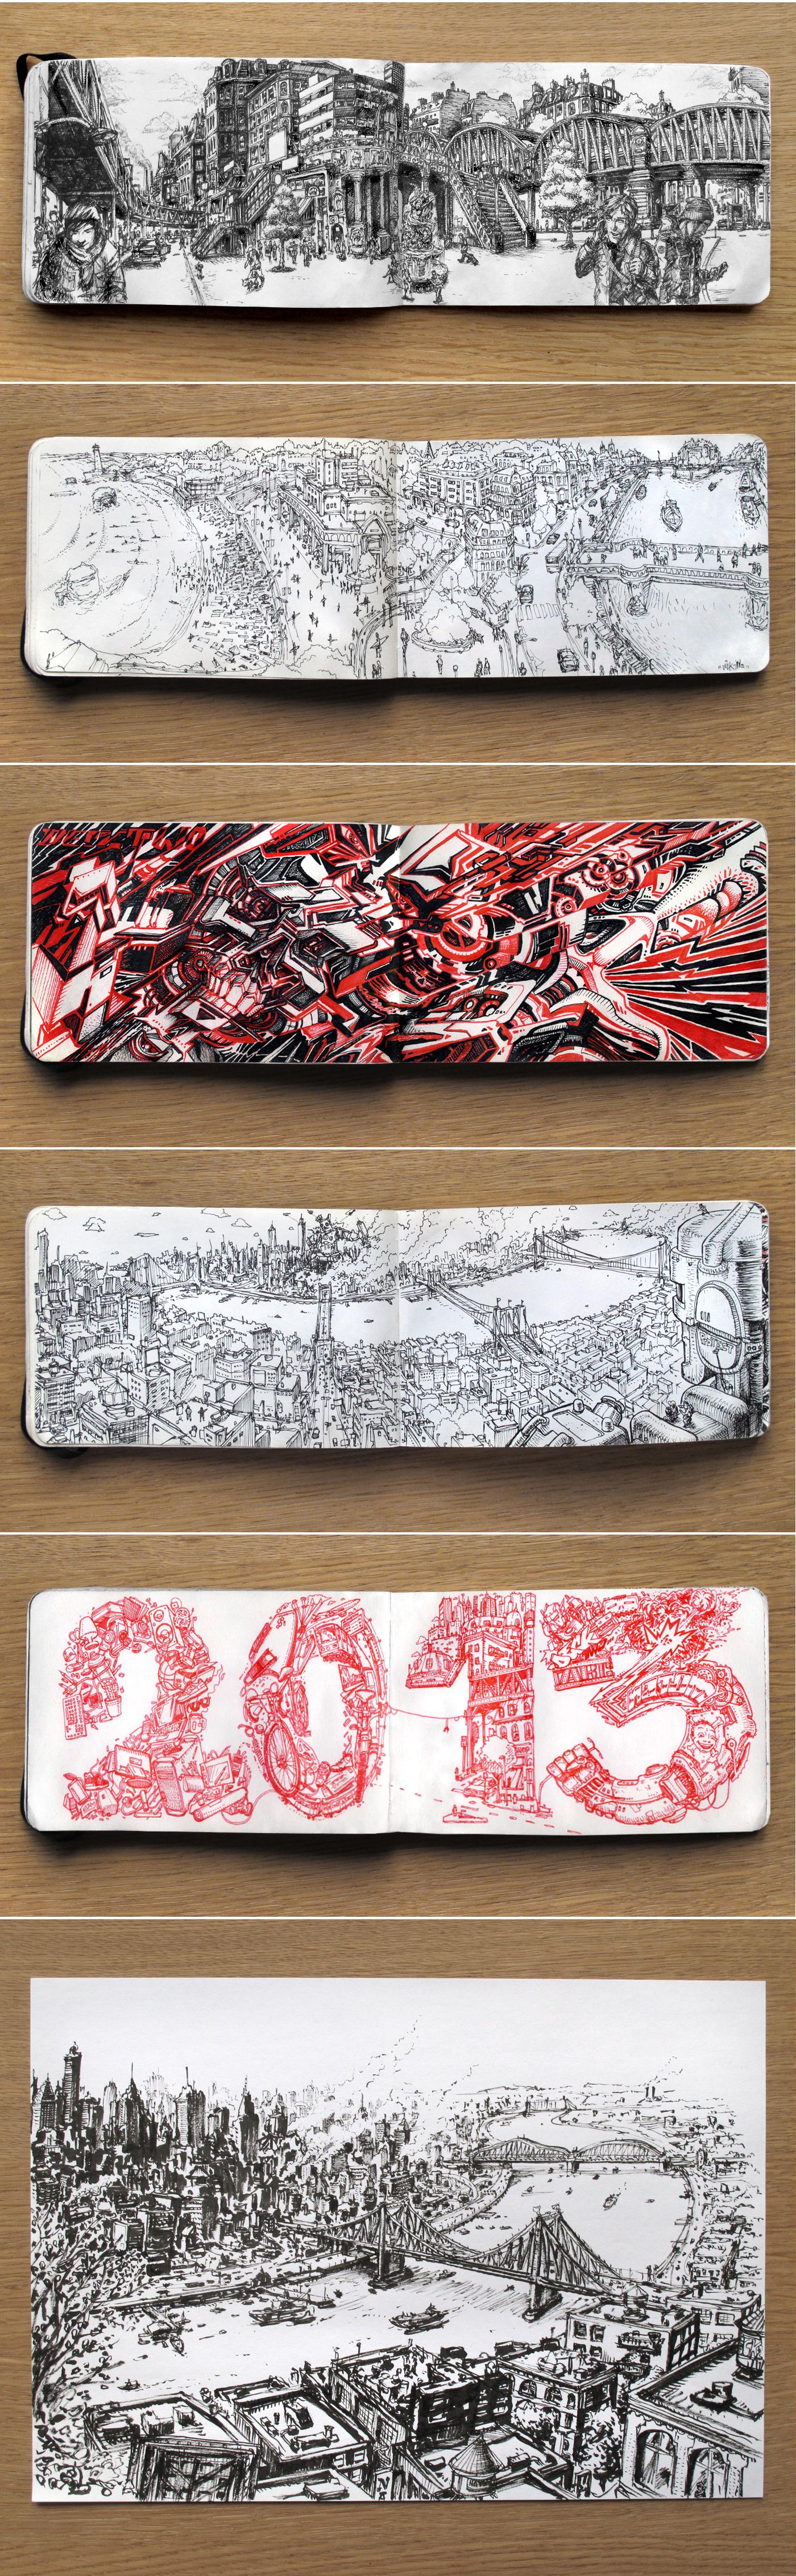 moleskine pen Landscape Biarritz New York doodles sketchs ink Pentel